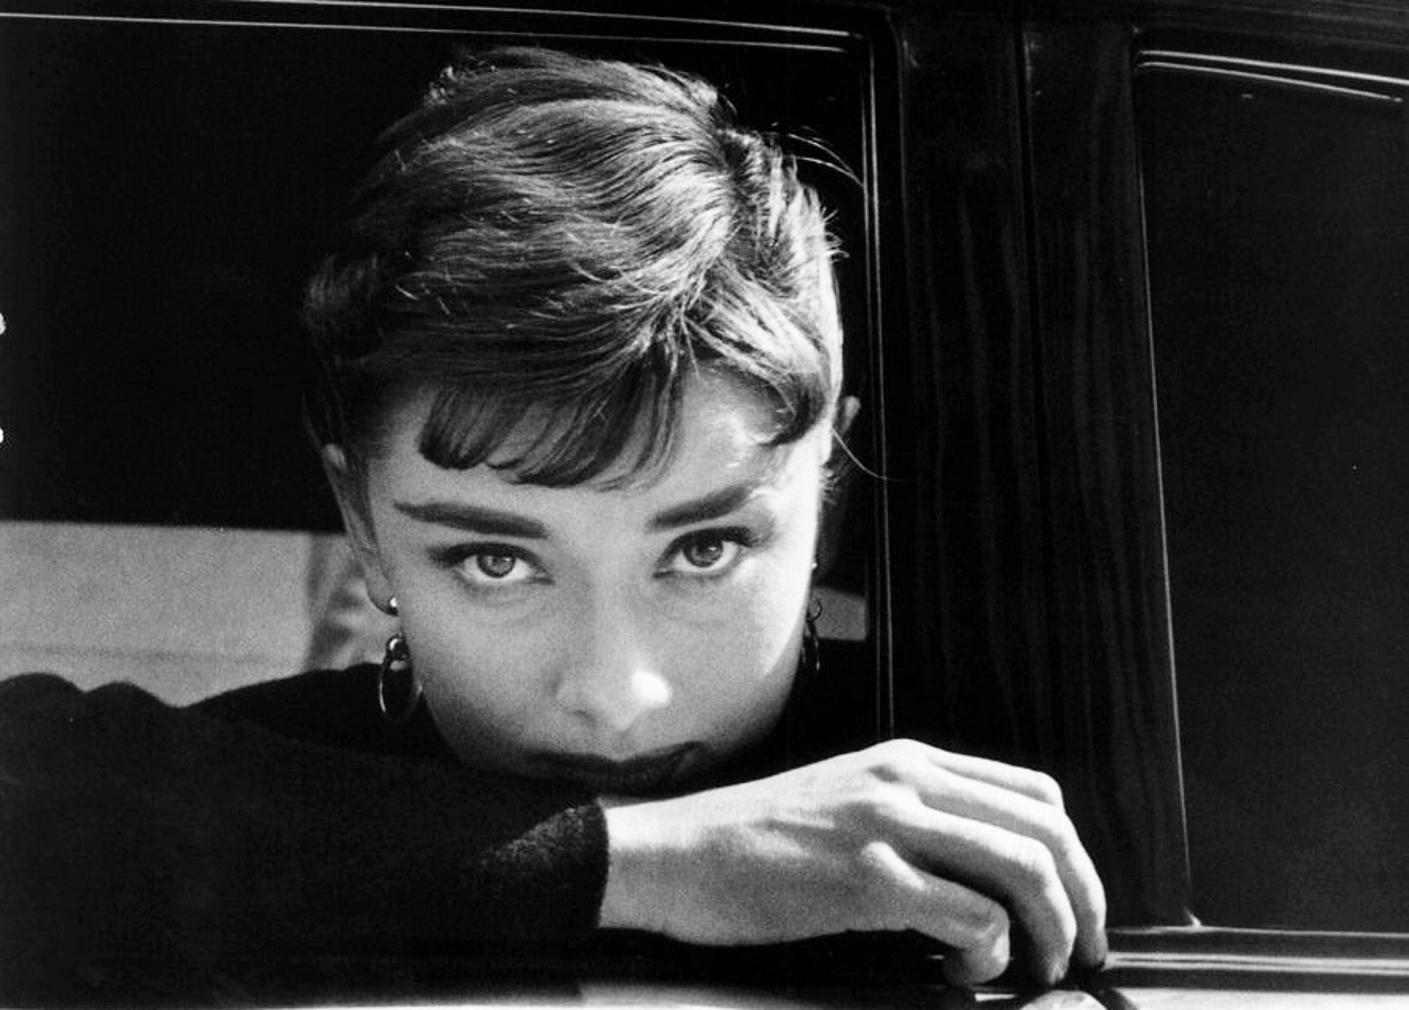 Audrey Hepburn Wallpaper And Background Image